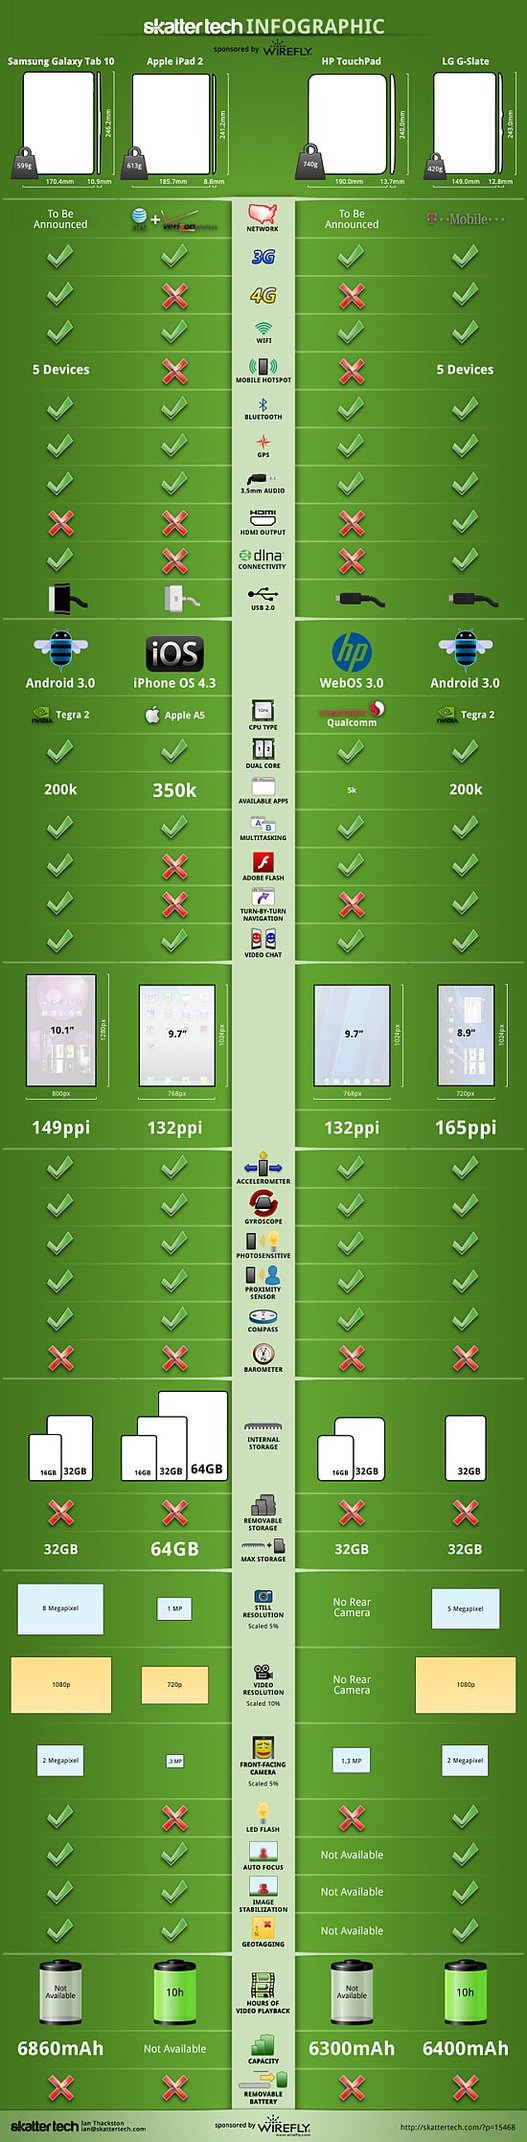 Sansung Galaxy Tab 10.1 vs iPad 2 vs HP Toouchpad vs LG G-Slate en 1 image